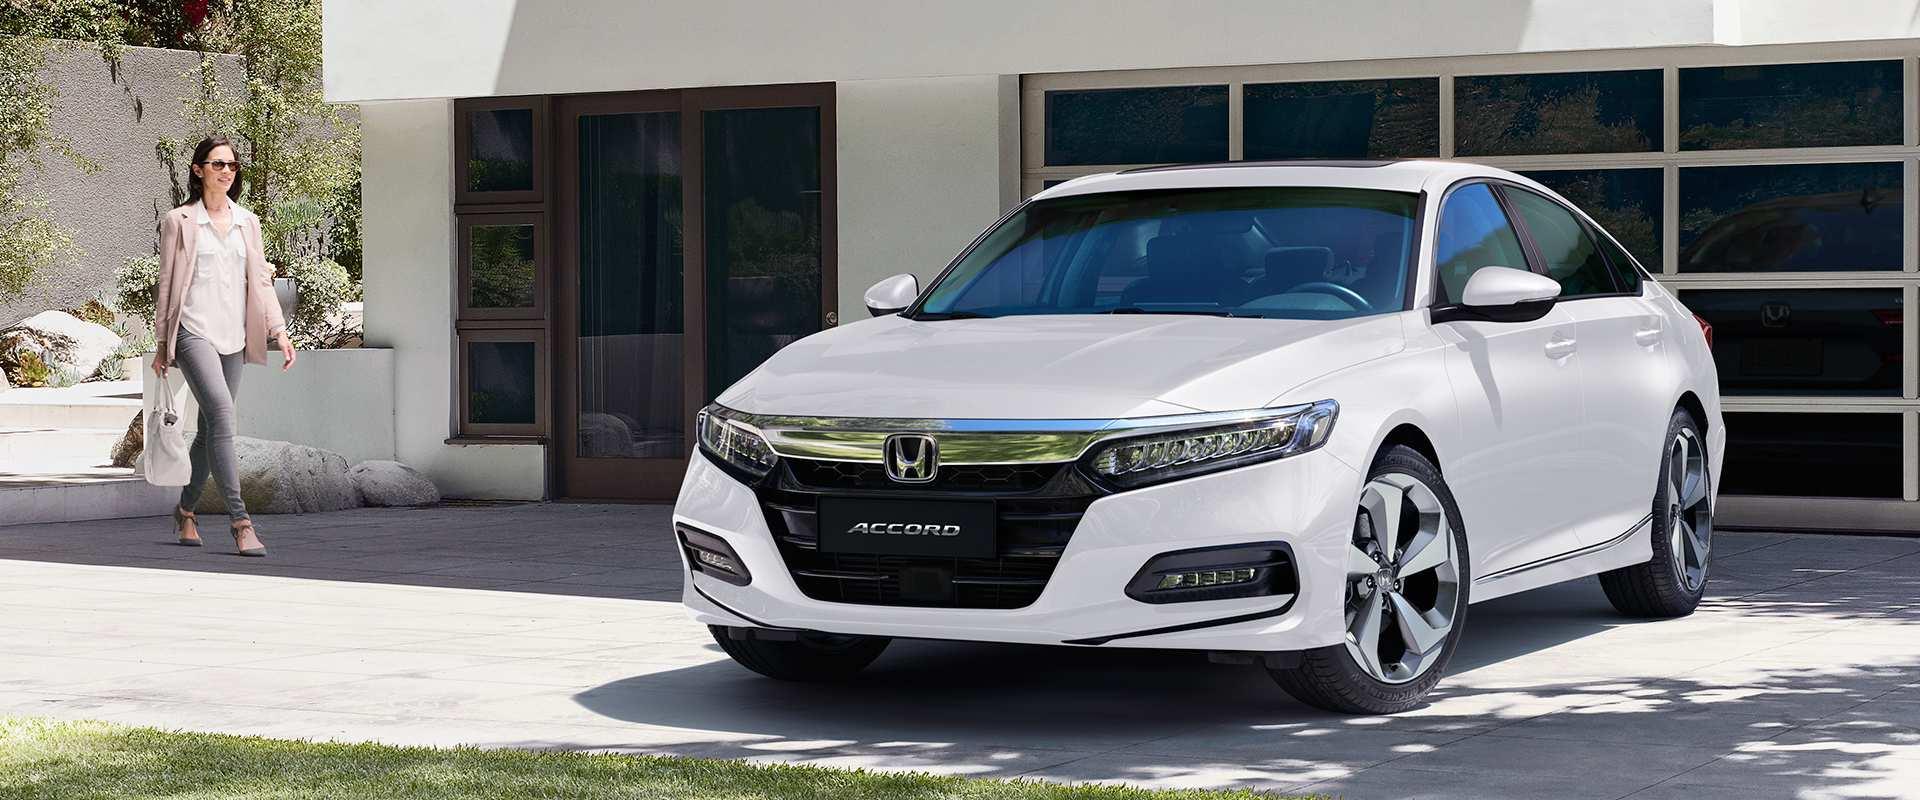 Honda Accord Touring - Design exclusivo,